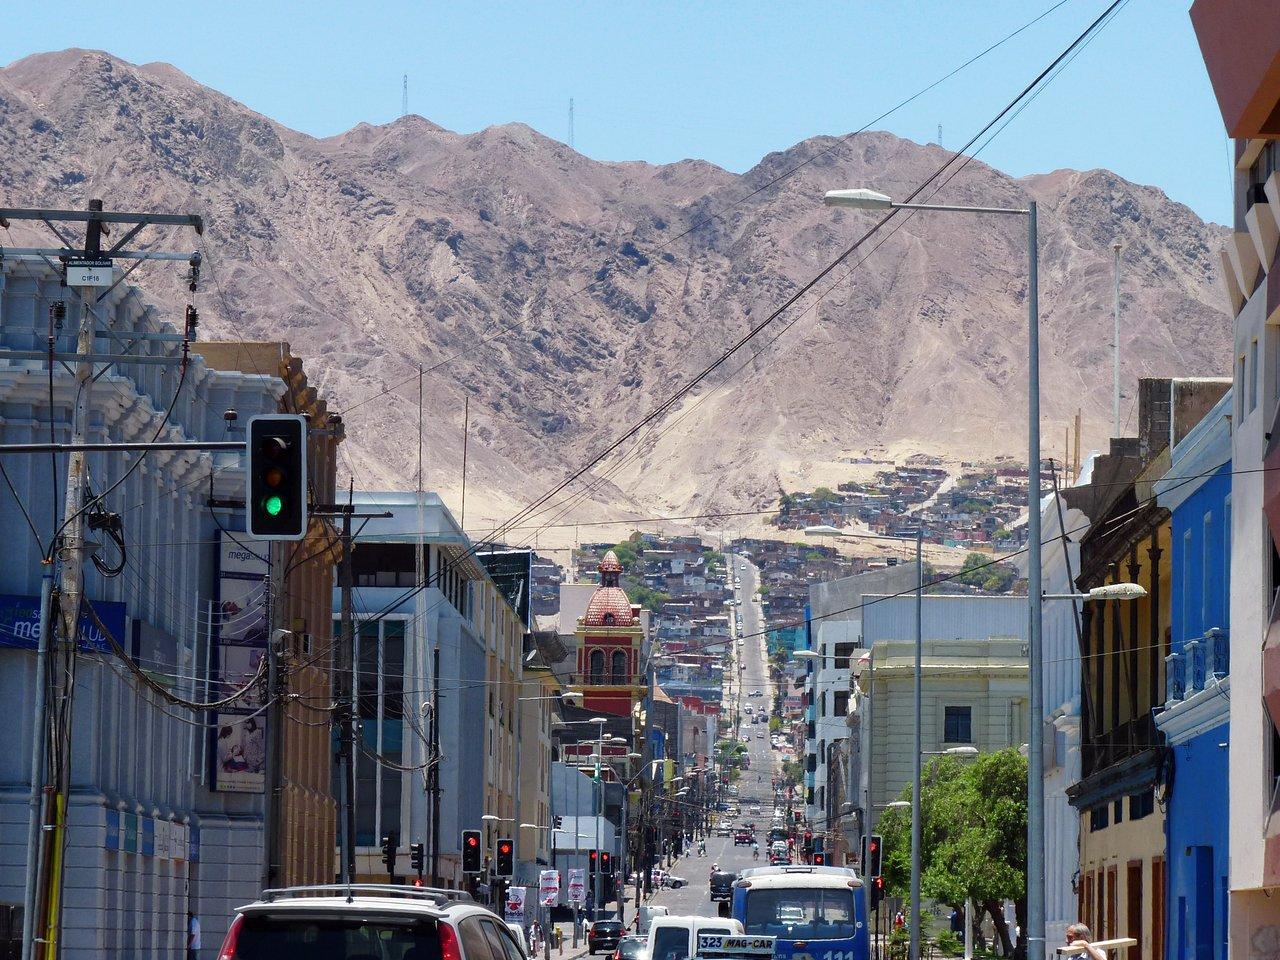 A main street in Antofagasta